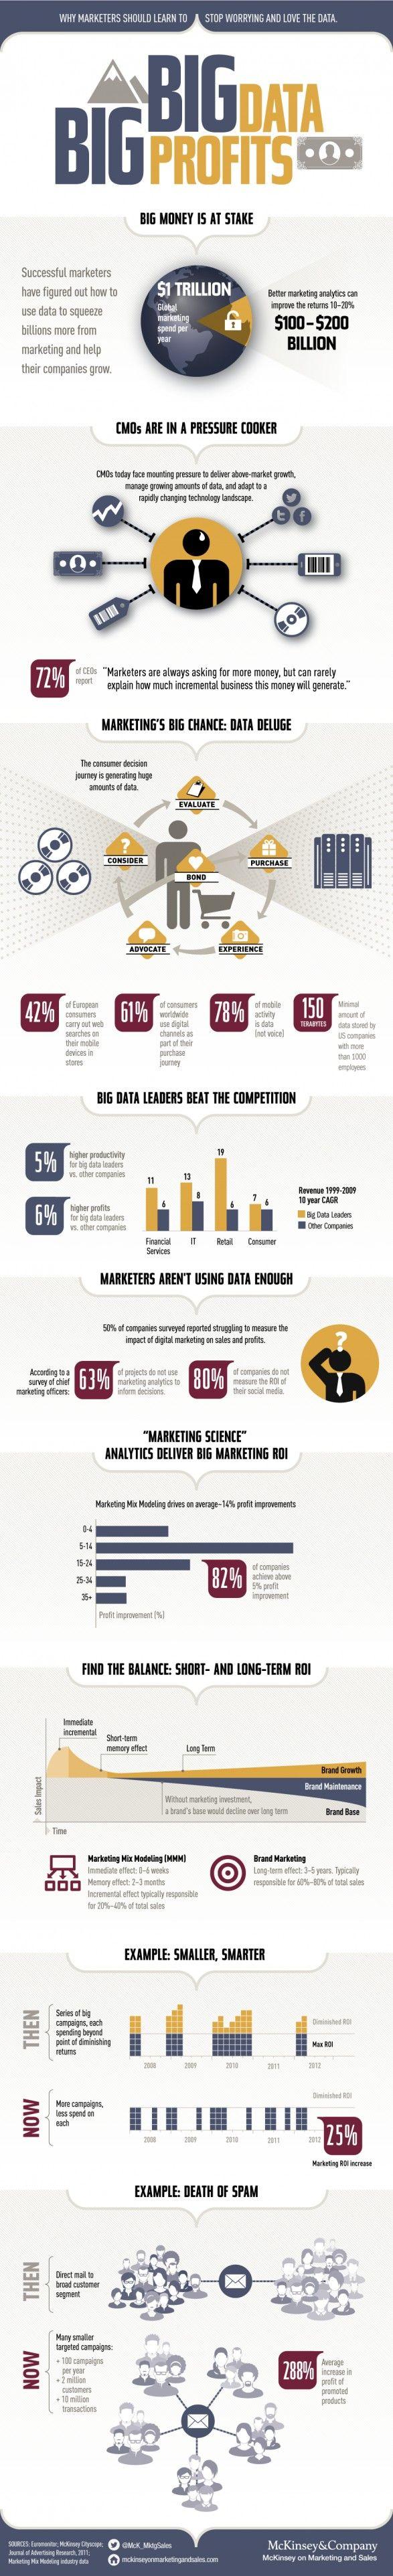 CMOs' Big Chance: Big Data (Infographic)